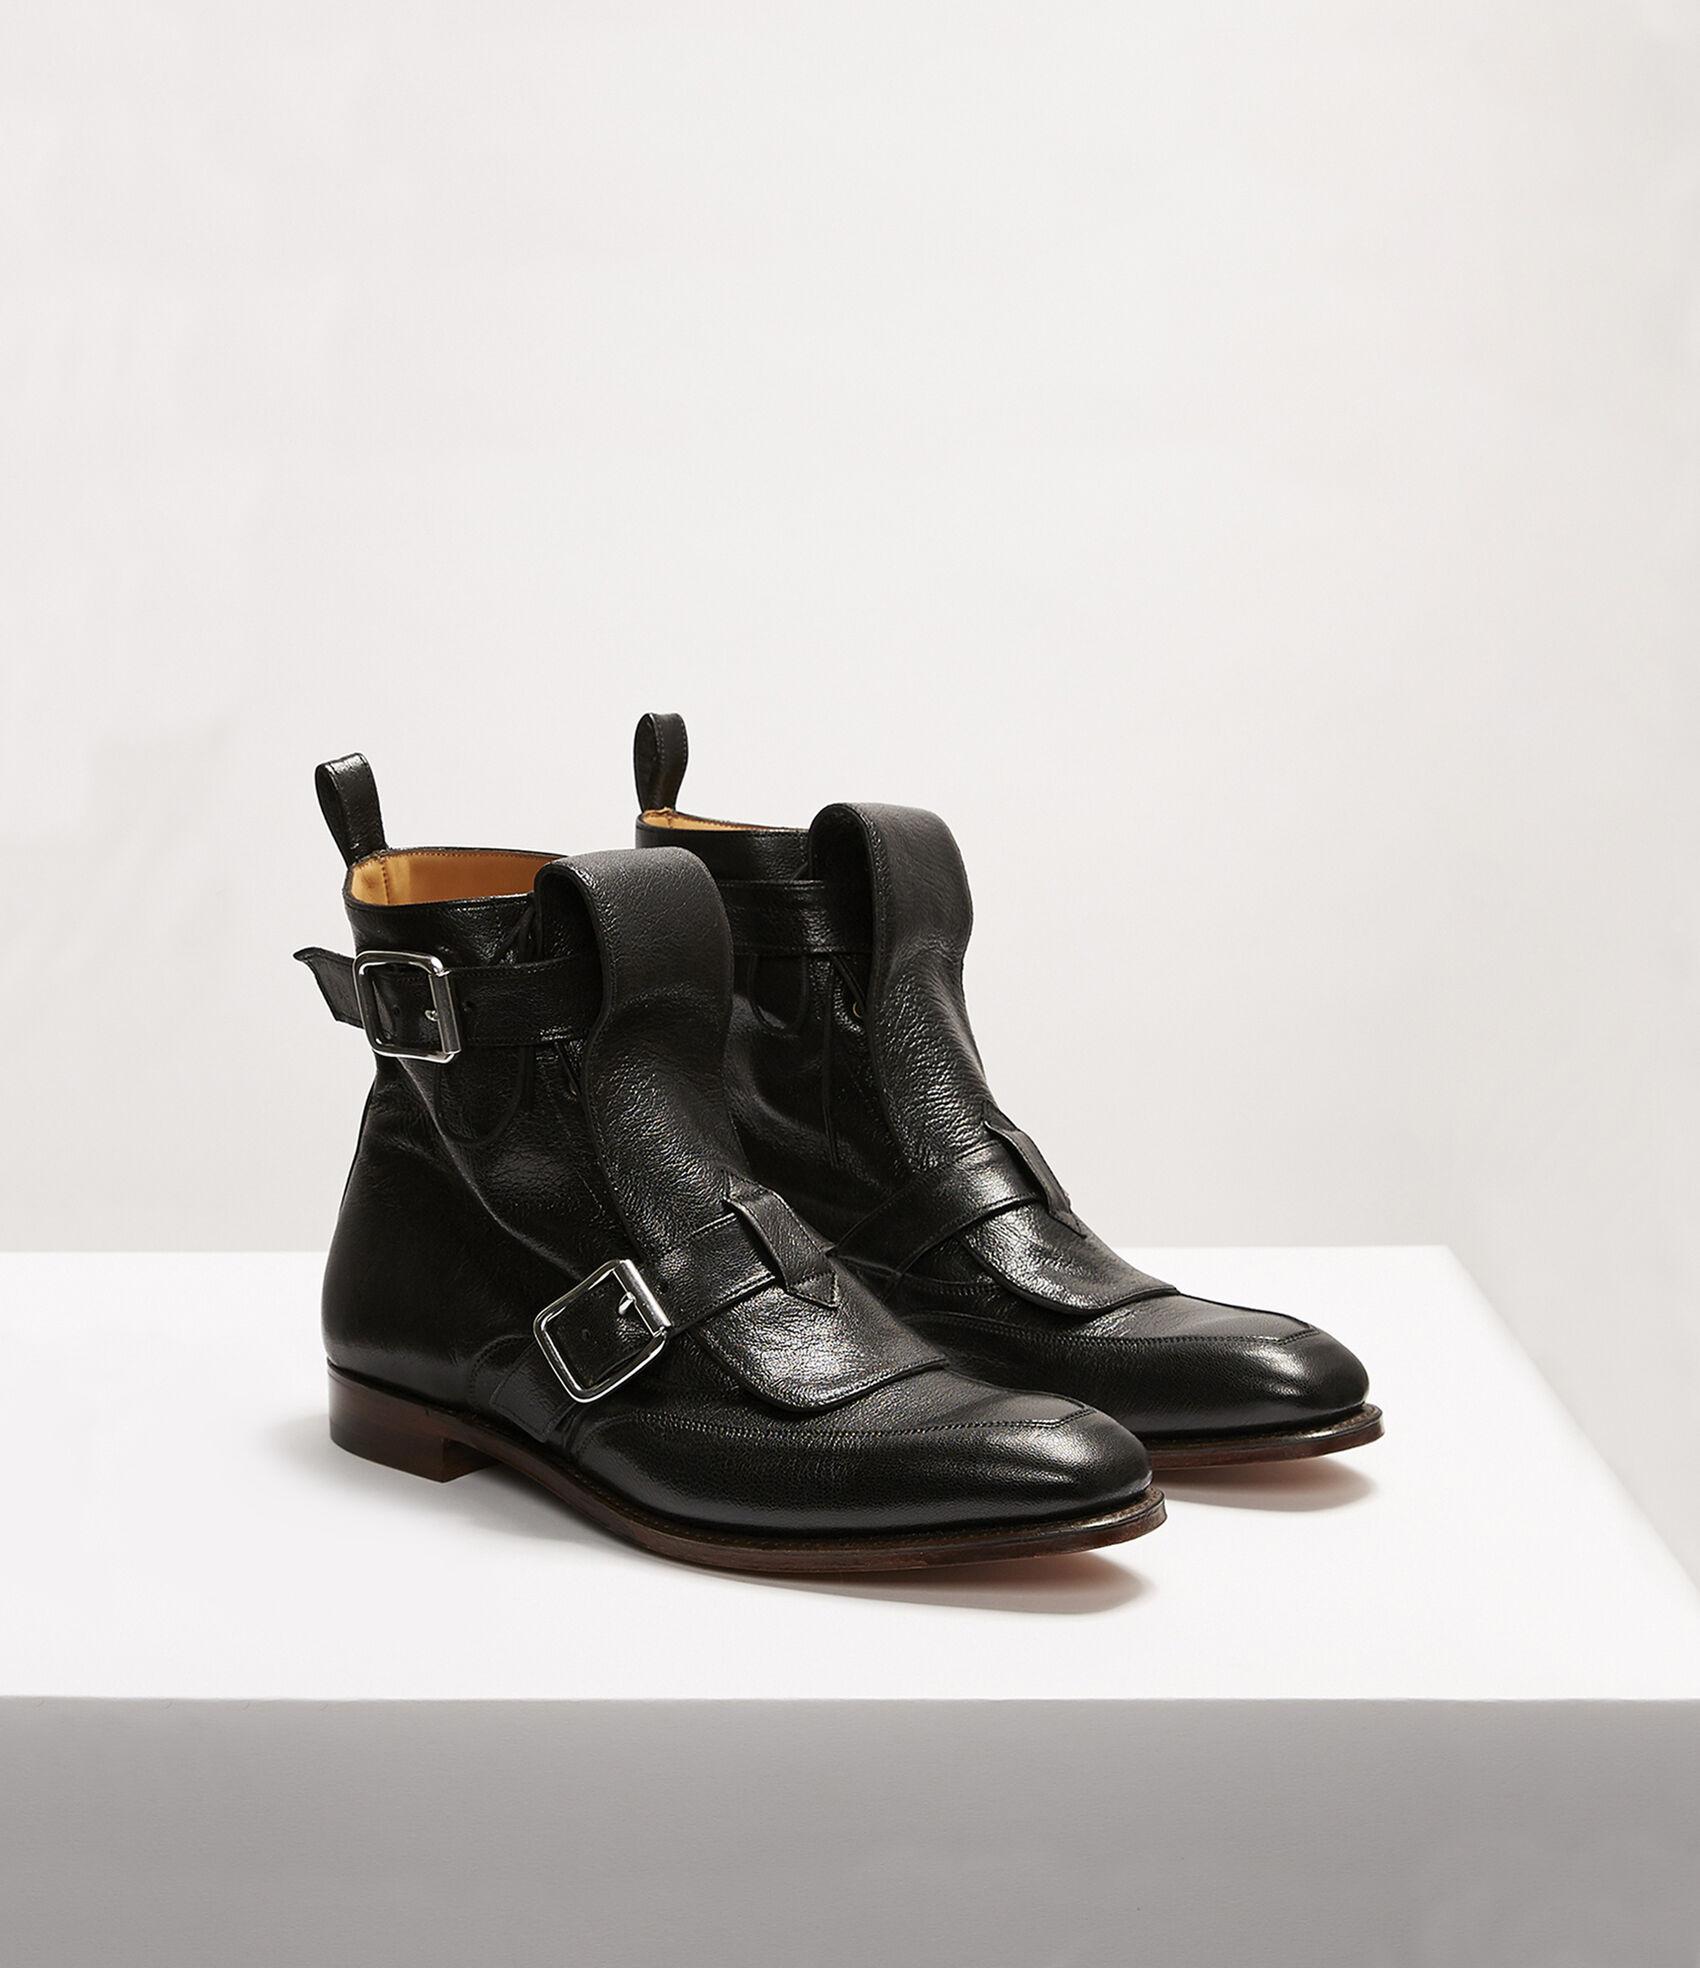 59a9bbf94820f7 Seditionary Punk Boots Black